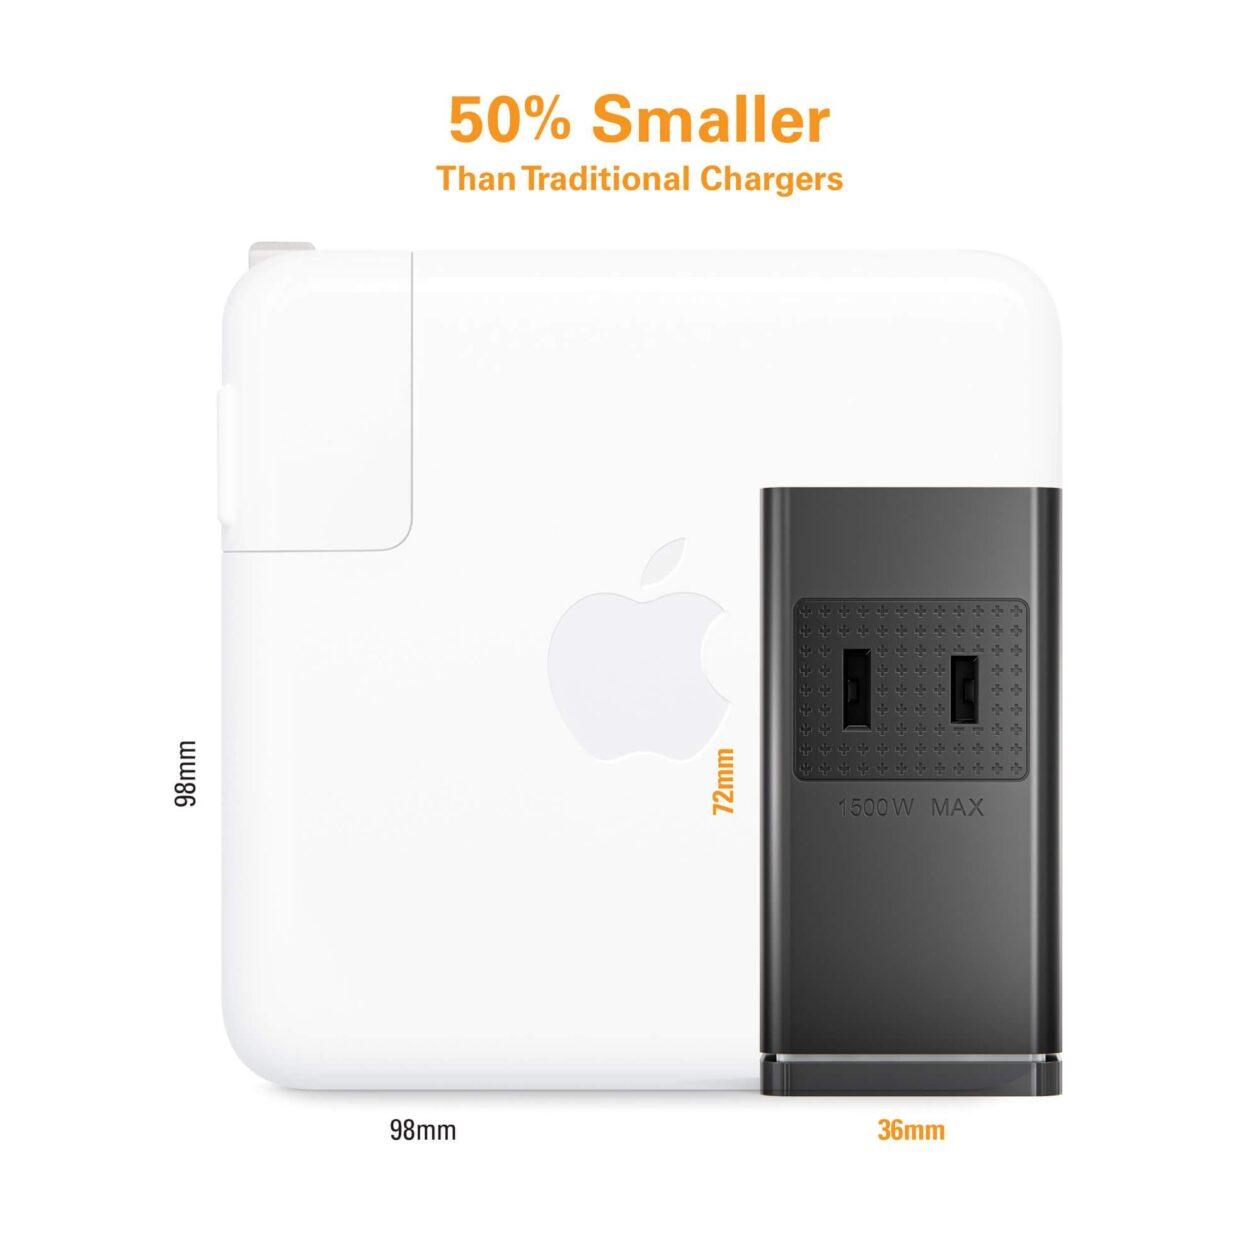 HyperJuice Charger vs MacBook